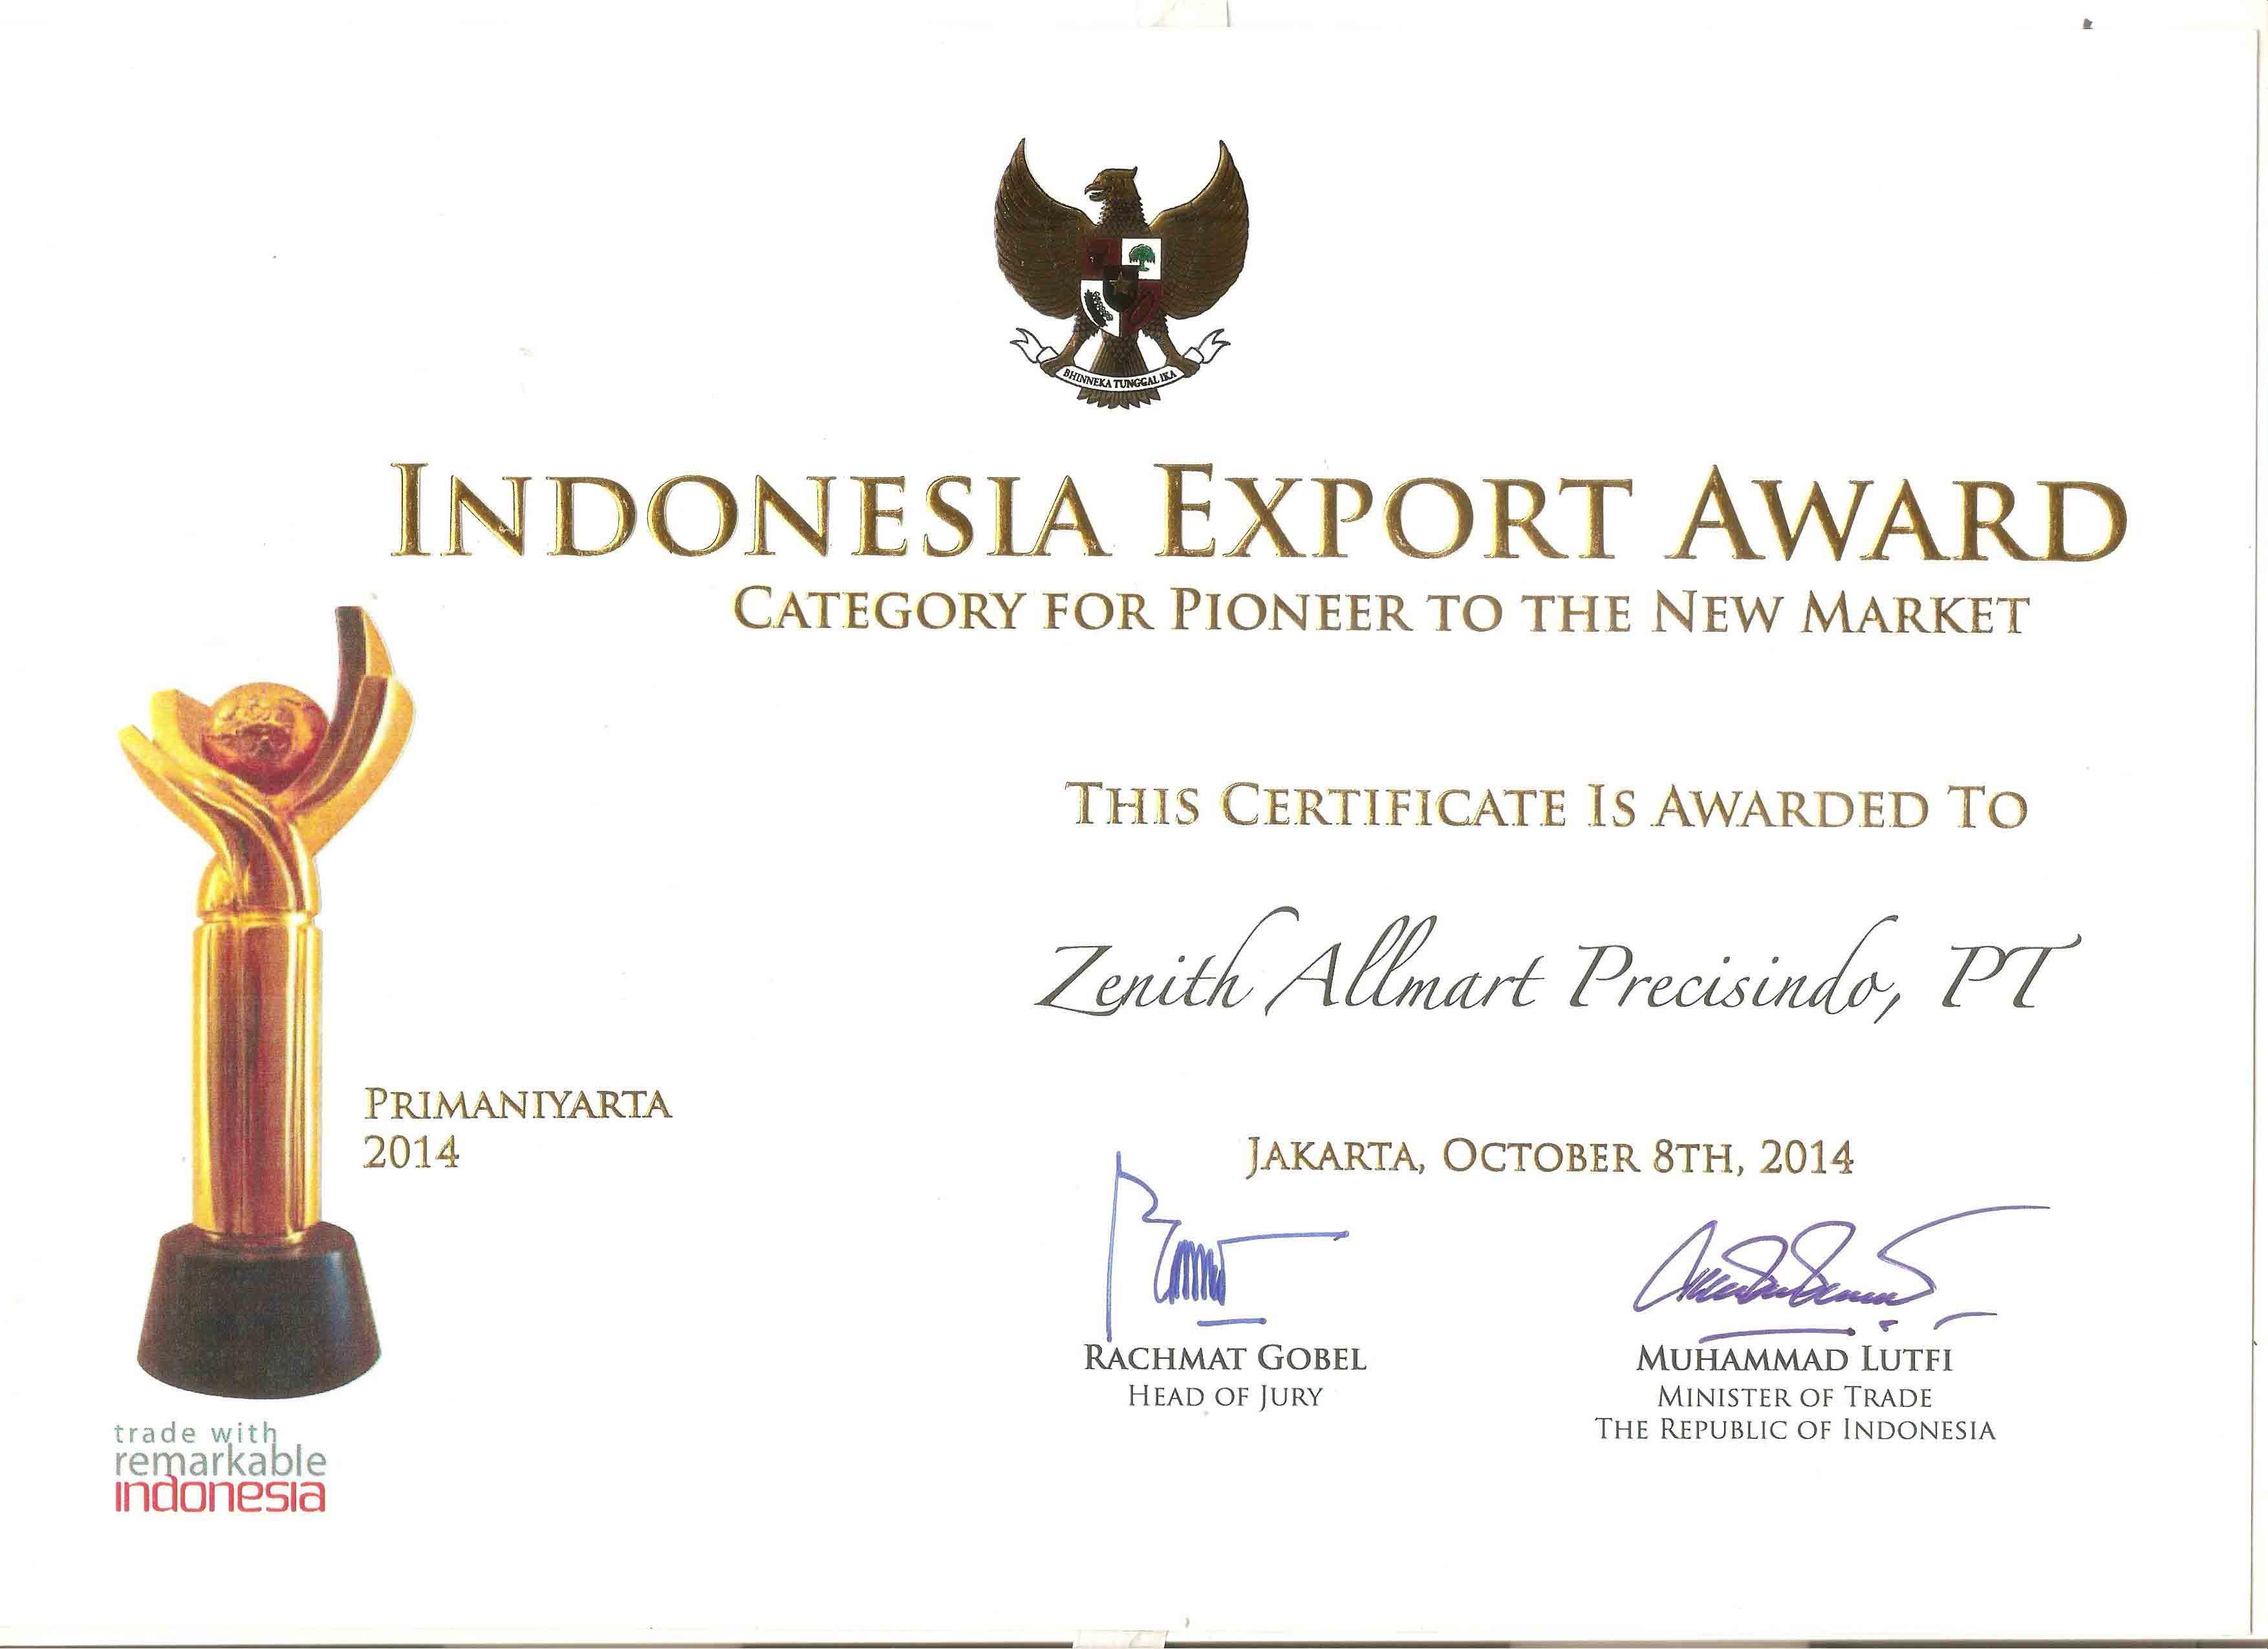 Primanyarta Award 2014